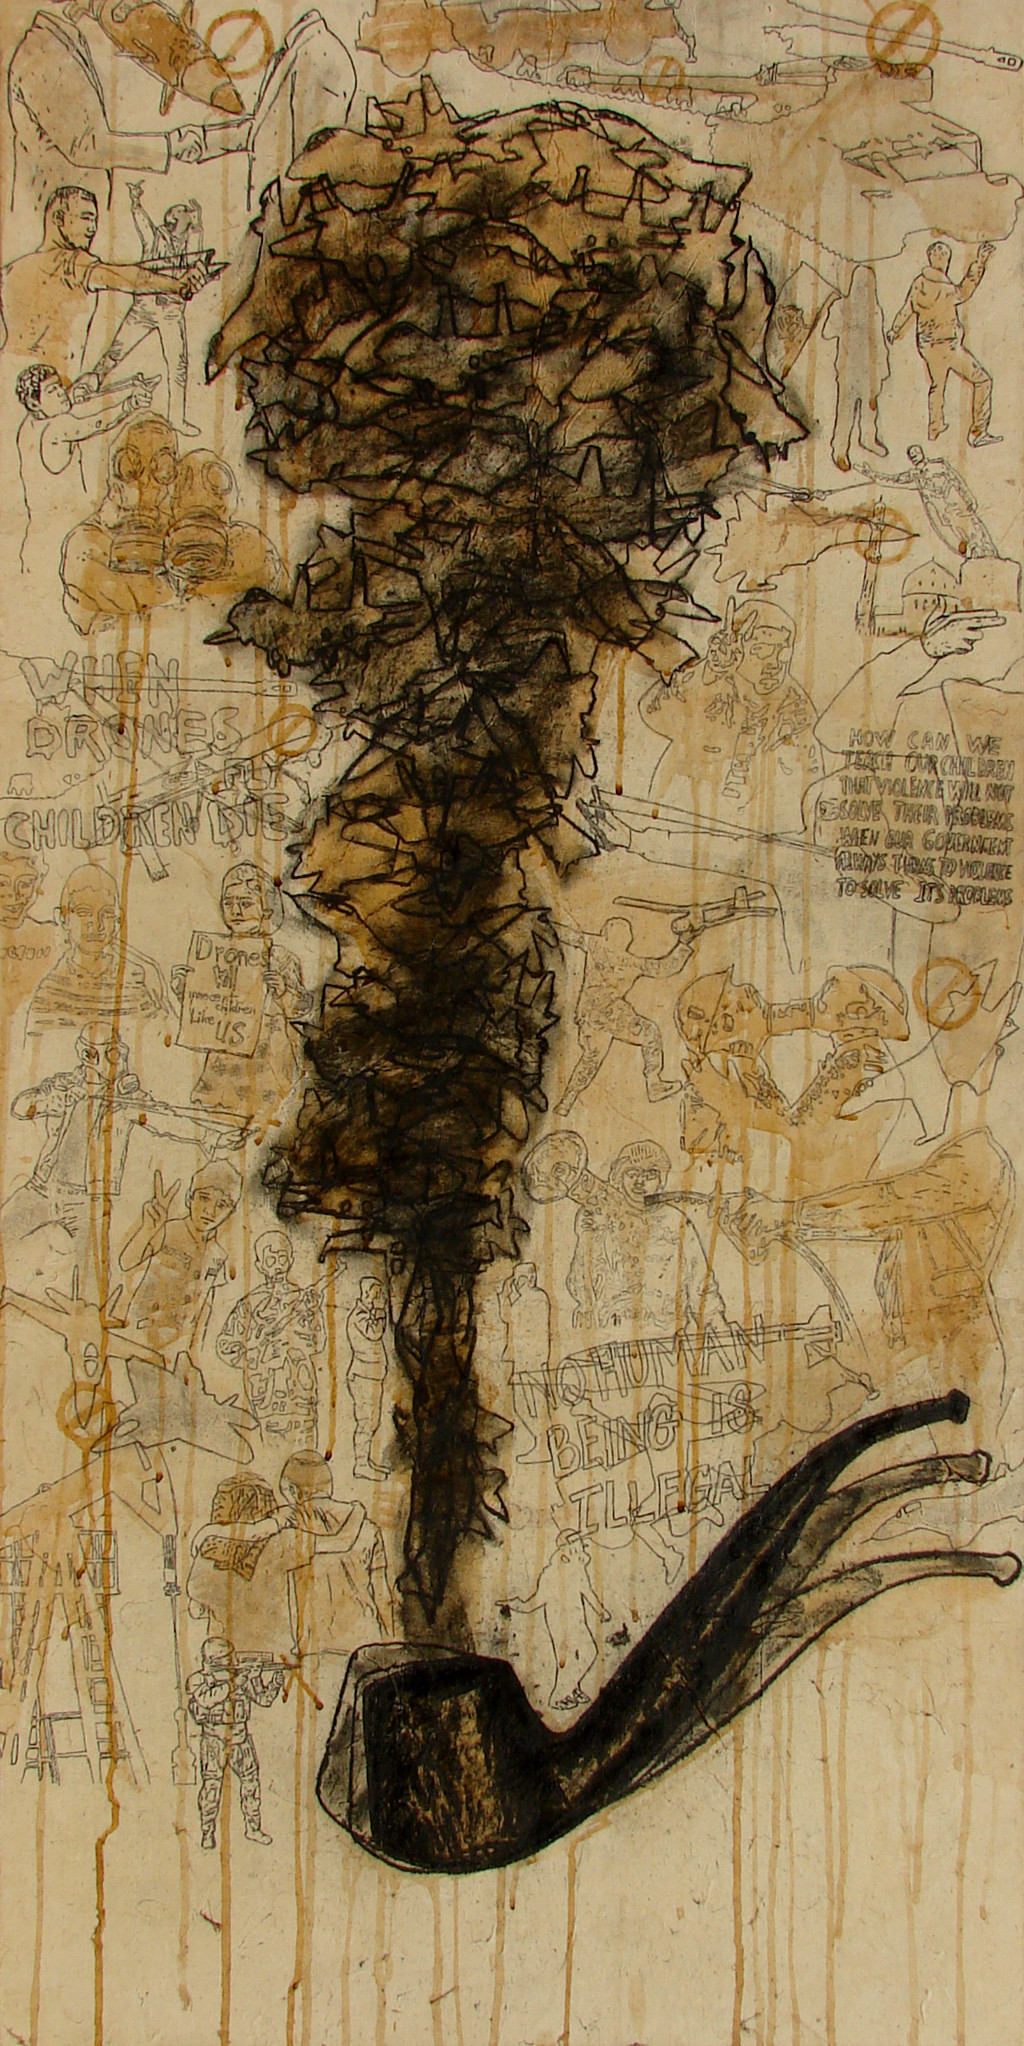 The Pipe of Democracy Digital Print by Rajib Chowdhury,Pop Art